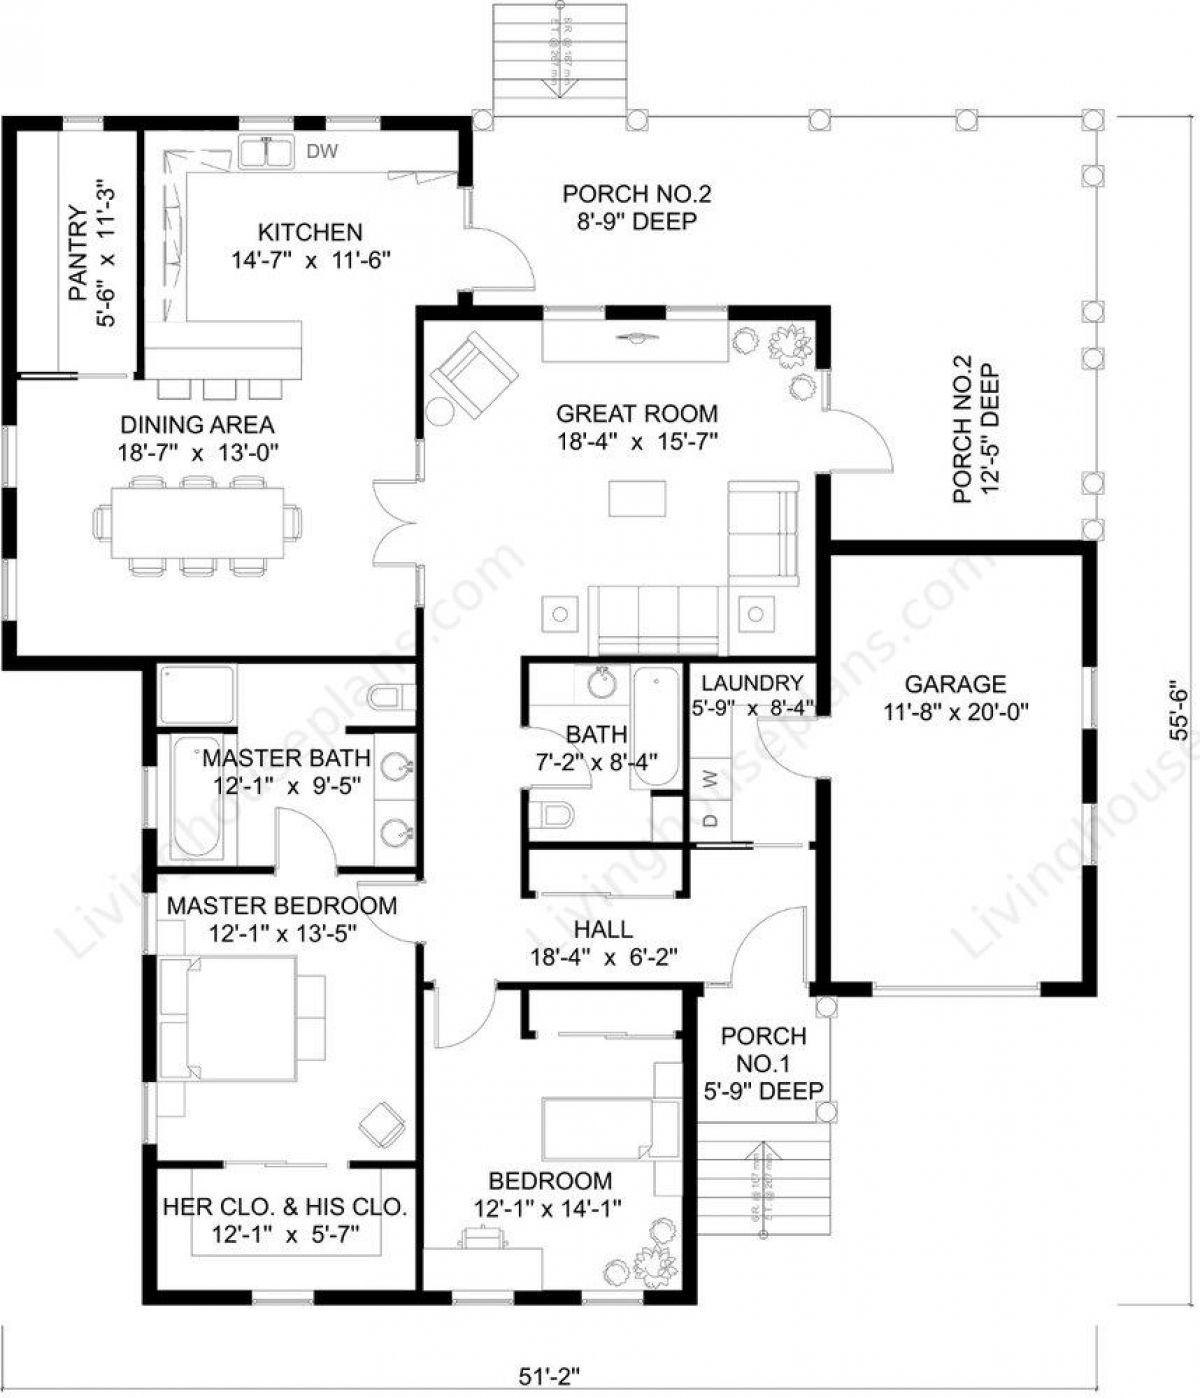 Pin By Mukamu Jelek On House Plans In 2020 Castle House Plans Building Plans House Craftsman House Plans